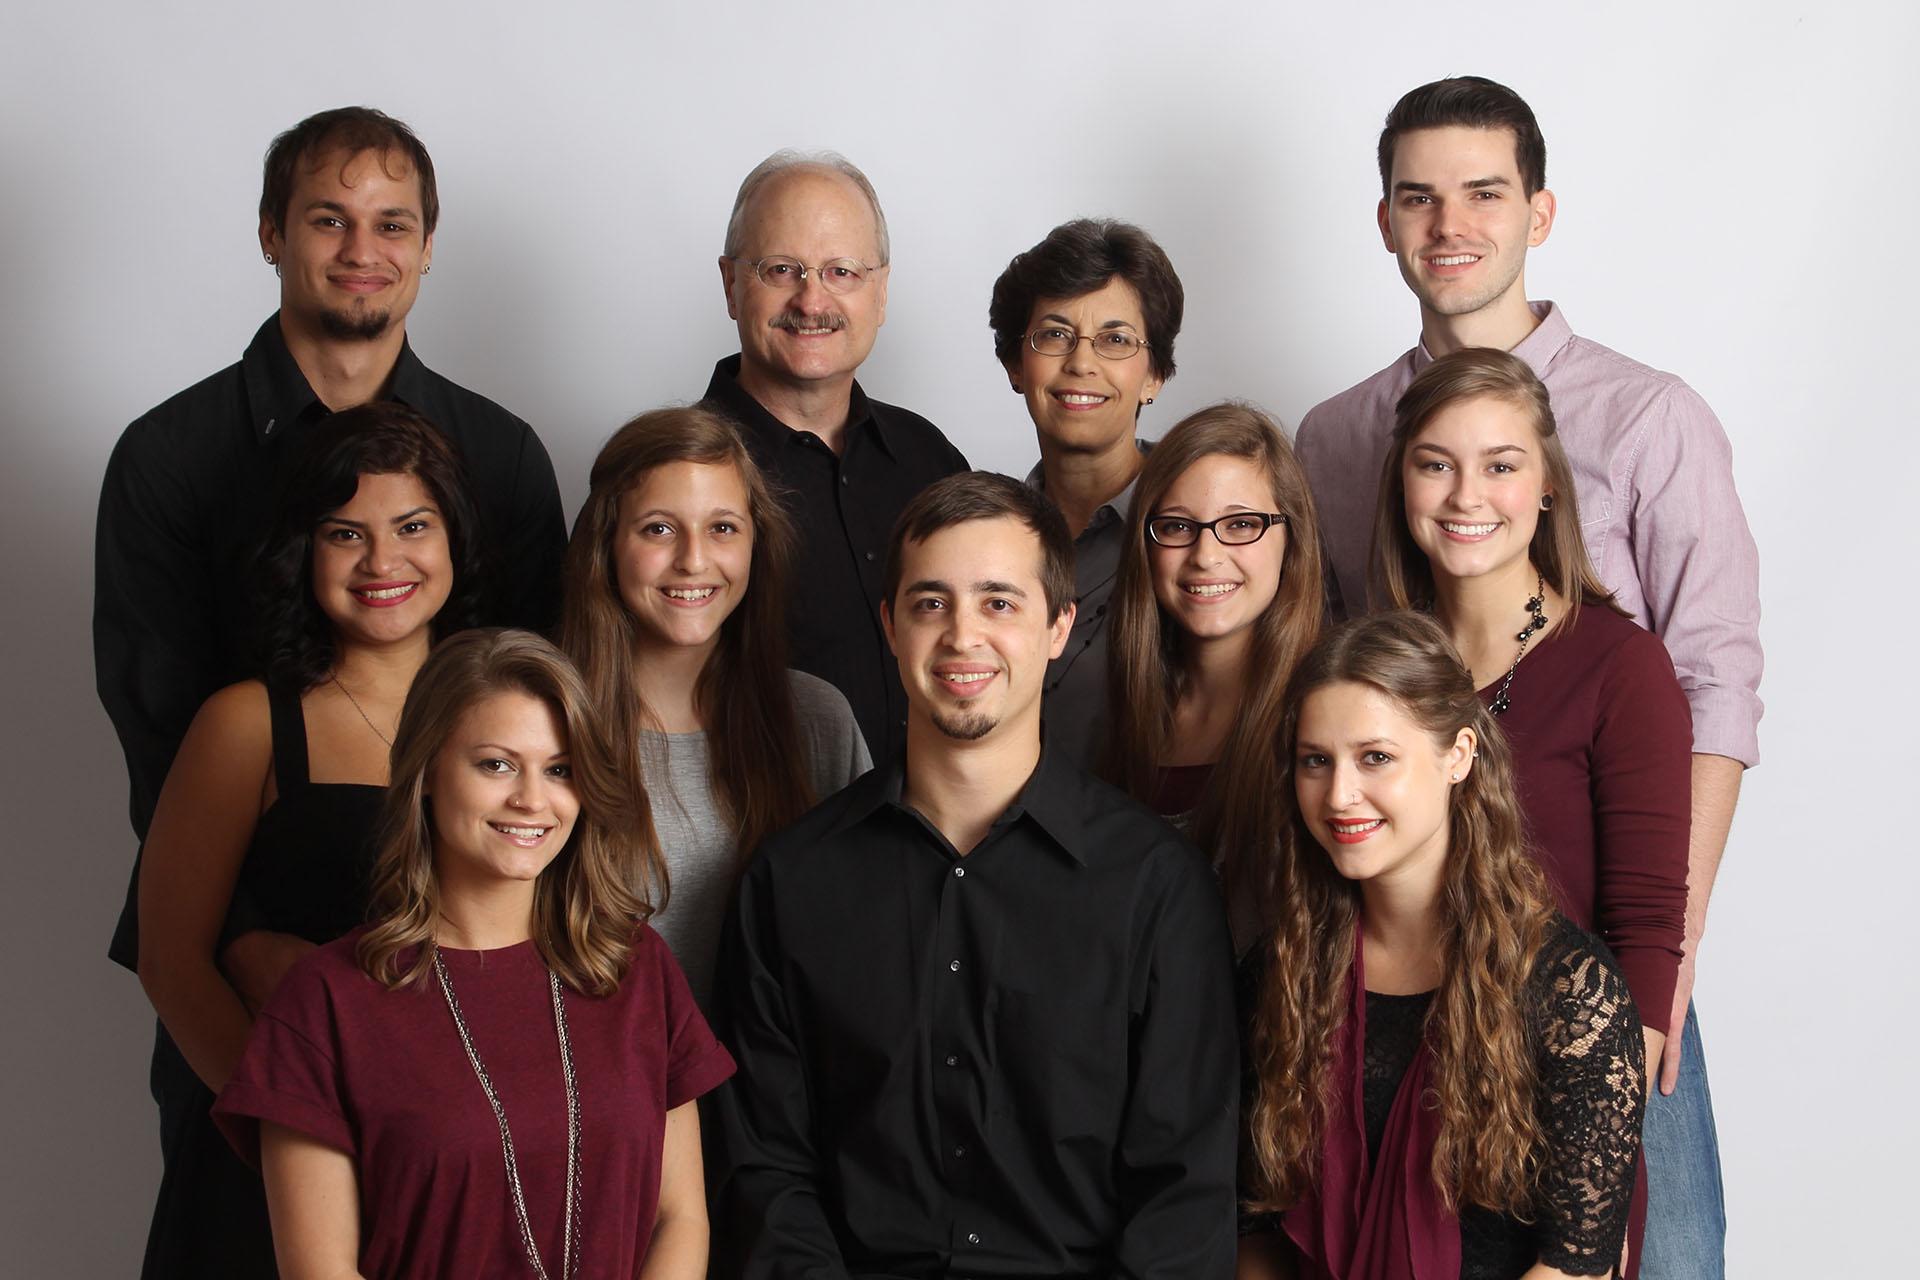 Good News Bob with Family in Magnolia Texas